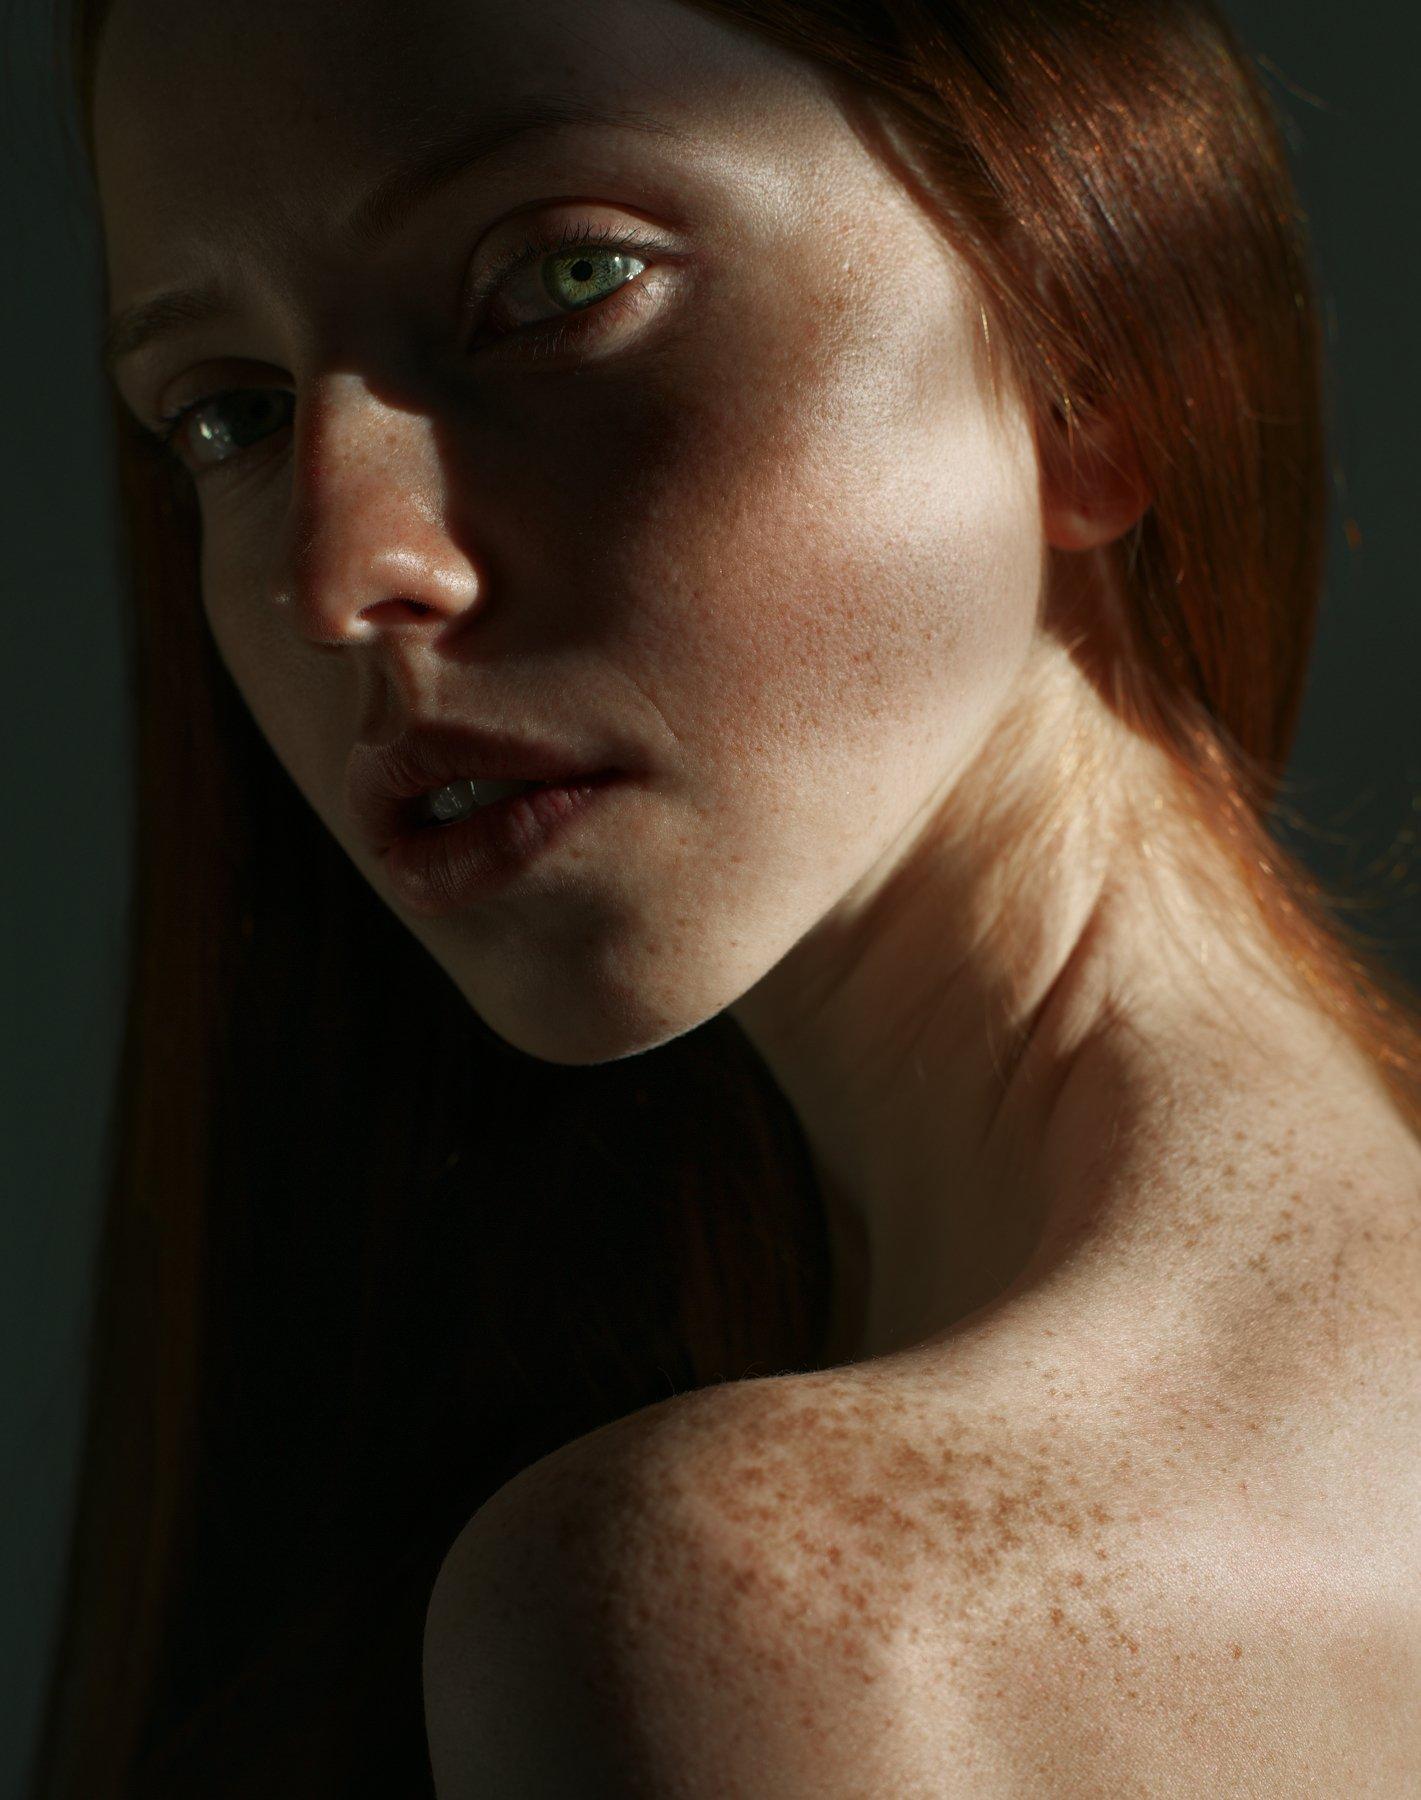 girl, portrait, ginger, freckles, green, eye, color, red, , Роман Филиппов